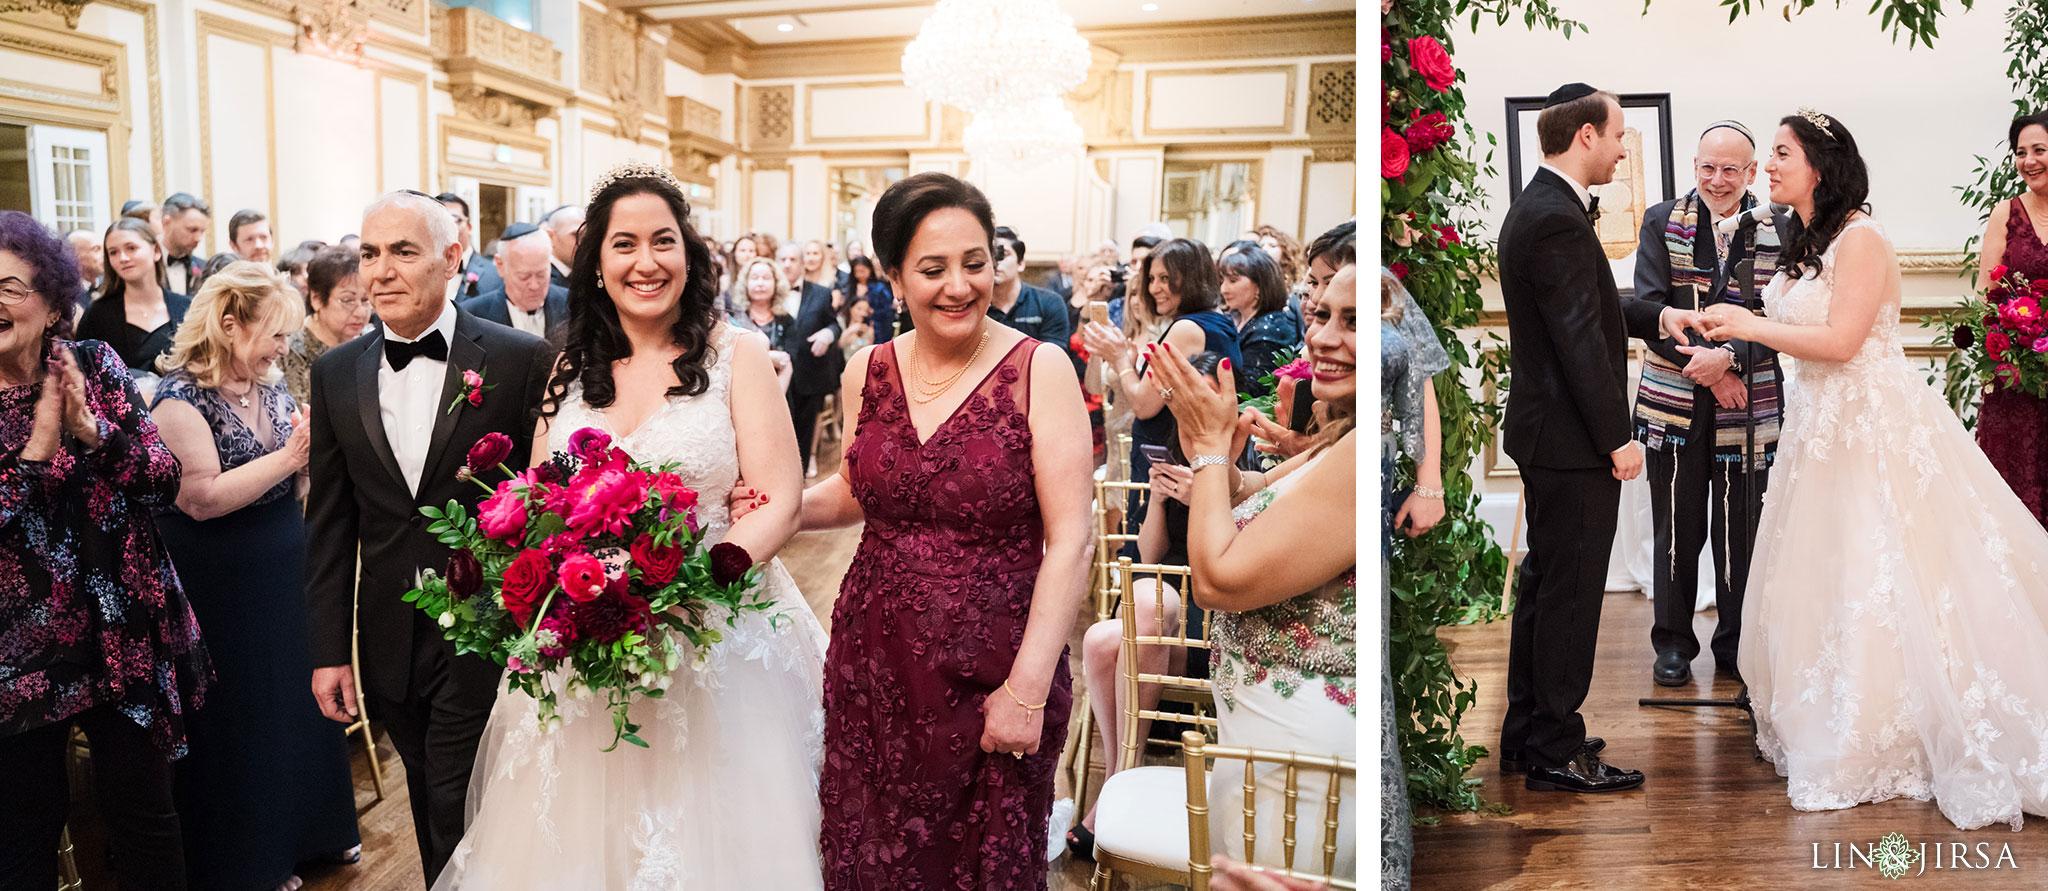 16 Alexandria Ballrooms Los Angeles Jewish Wedding Photography